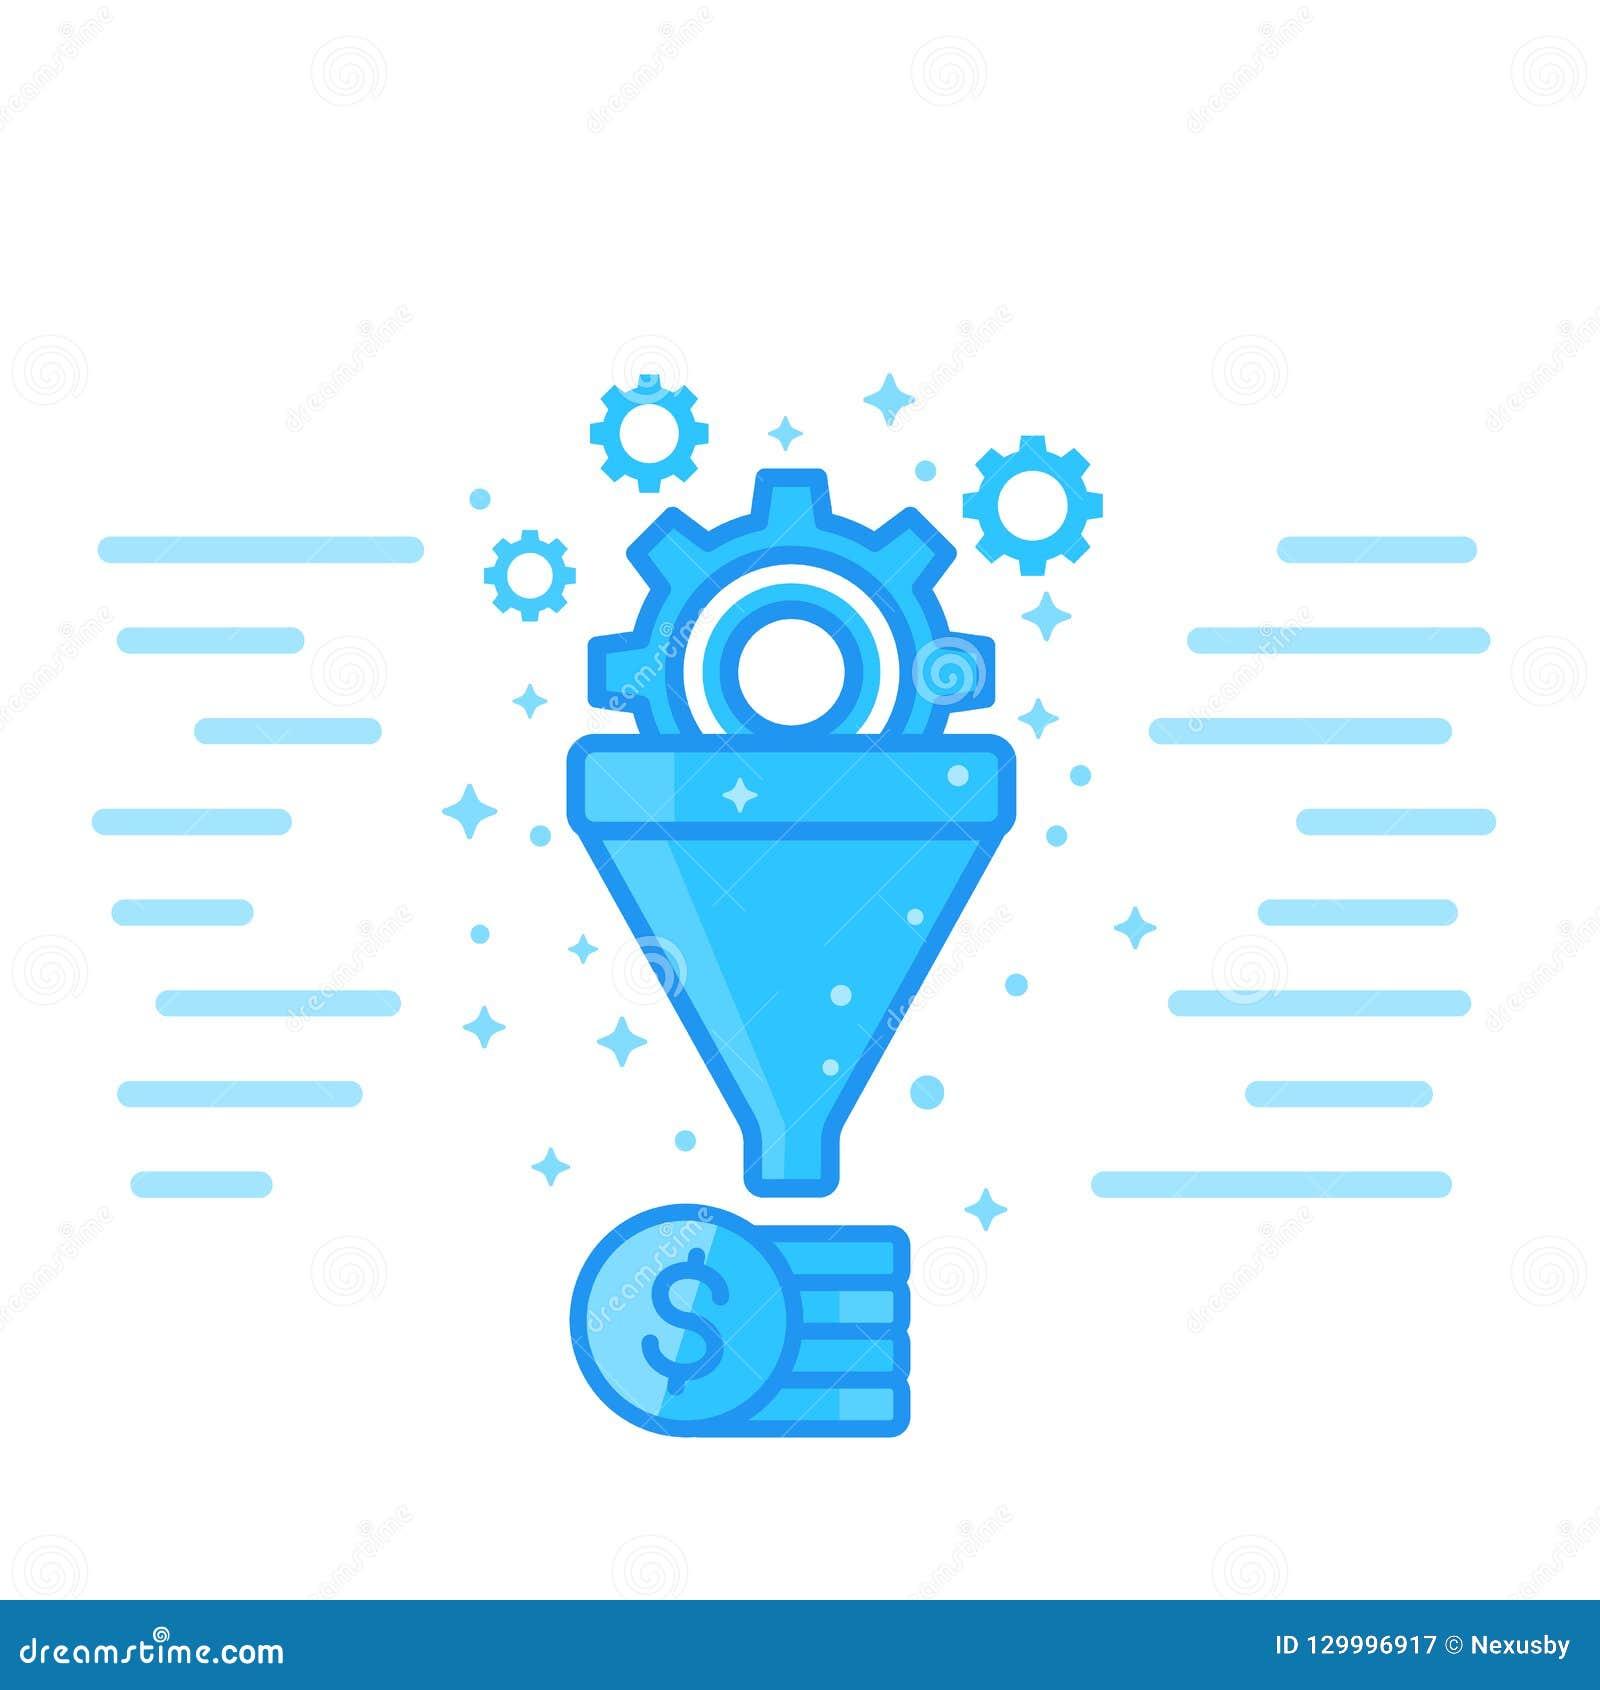 sales funnel vector digital marketing stock vector illustration of optimization graphic 129996917 https www dreamstime com sales funnel vector illustration digital marketing concept image129996917